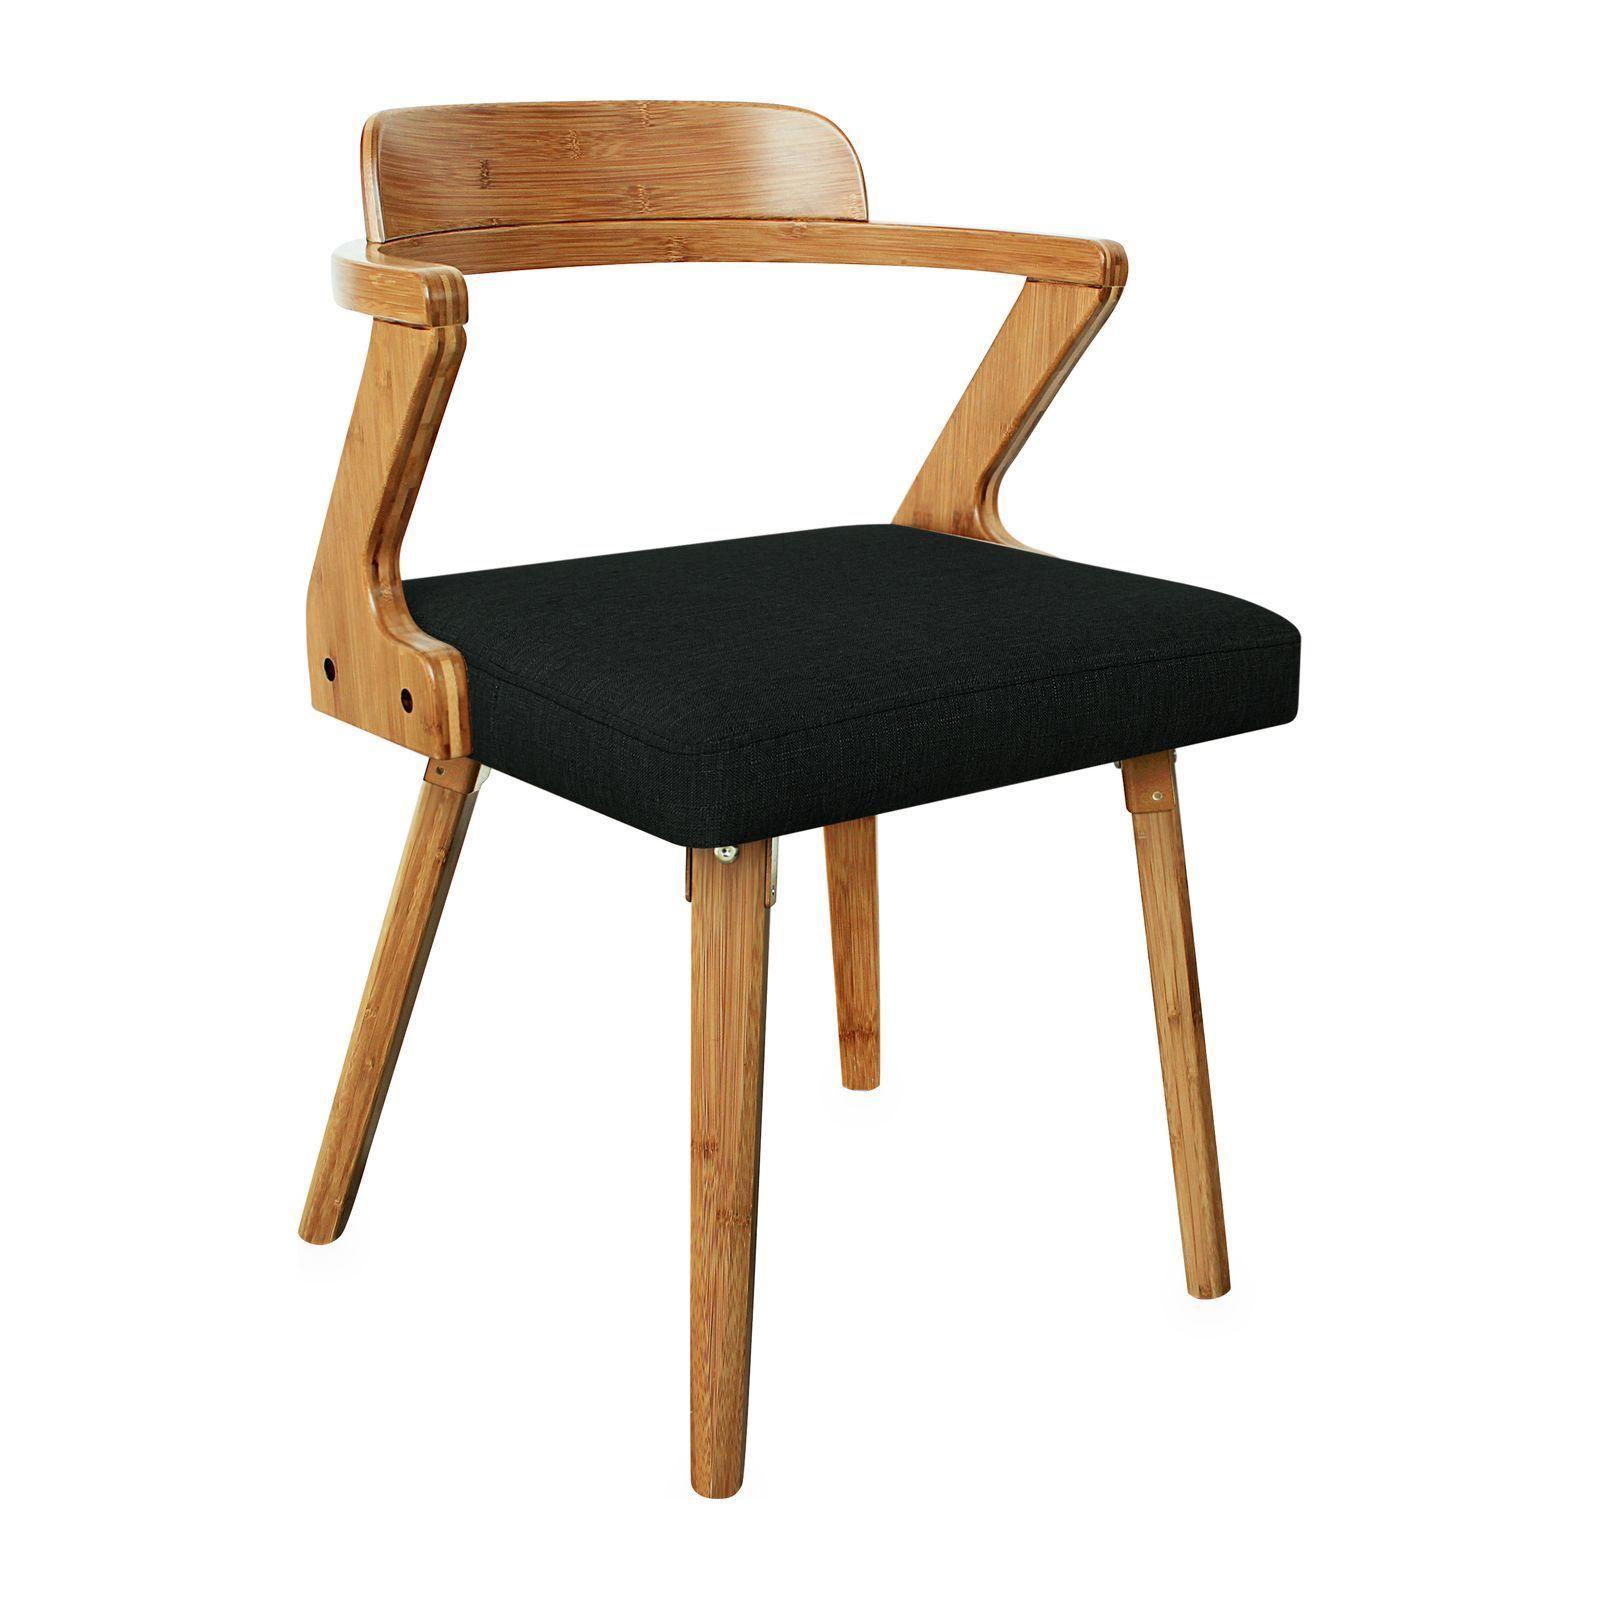 potiron new york chaise noir id e maison chaise. Black Bedroom Furniture Sets. Home Design Ideas